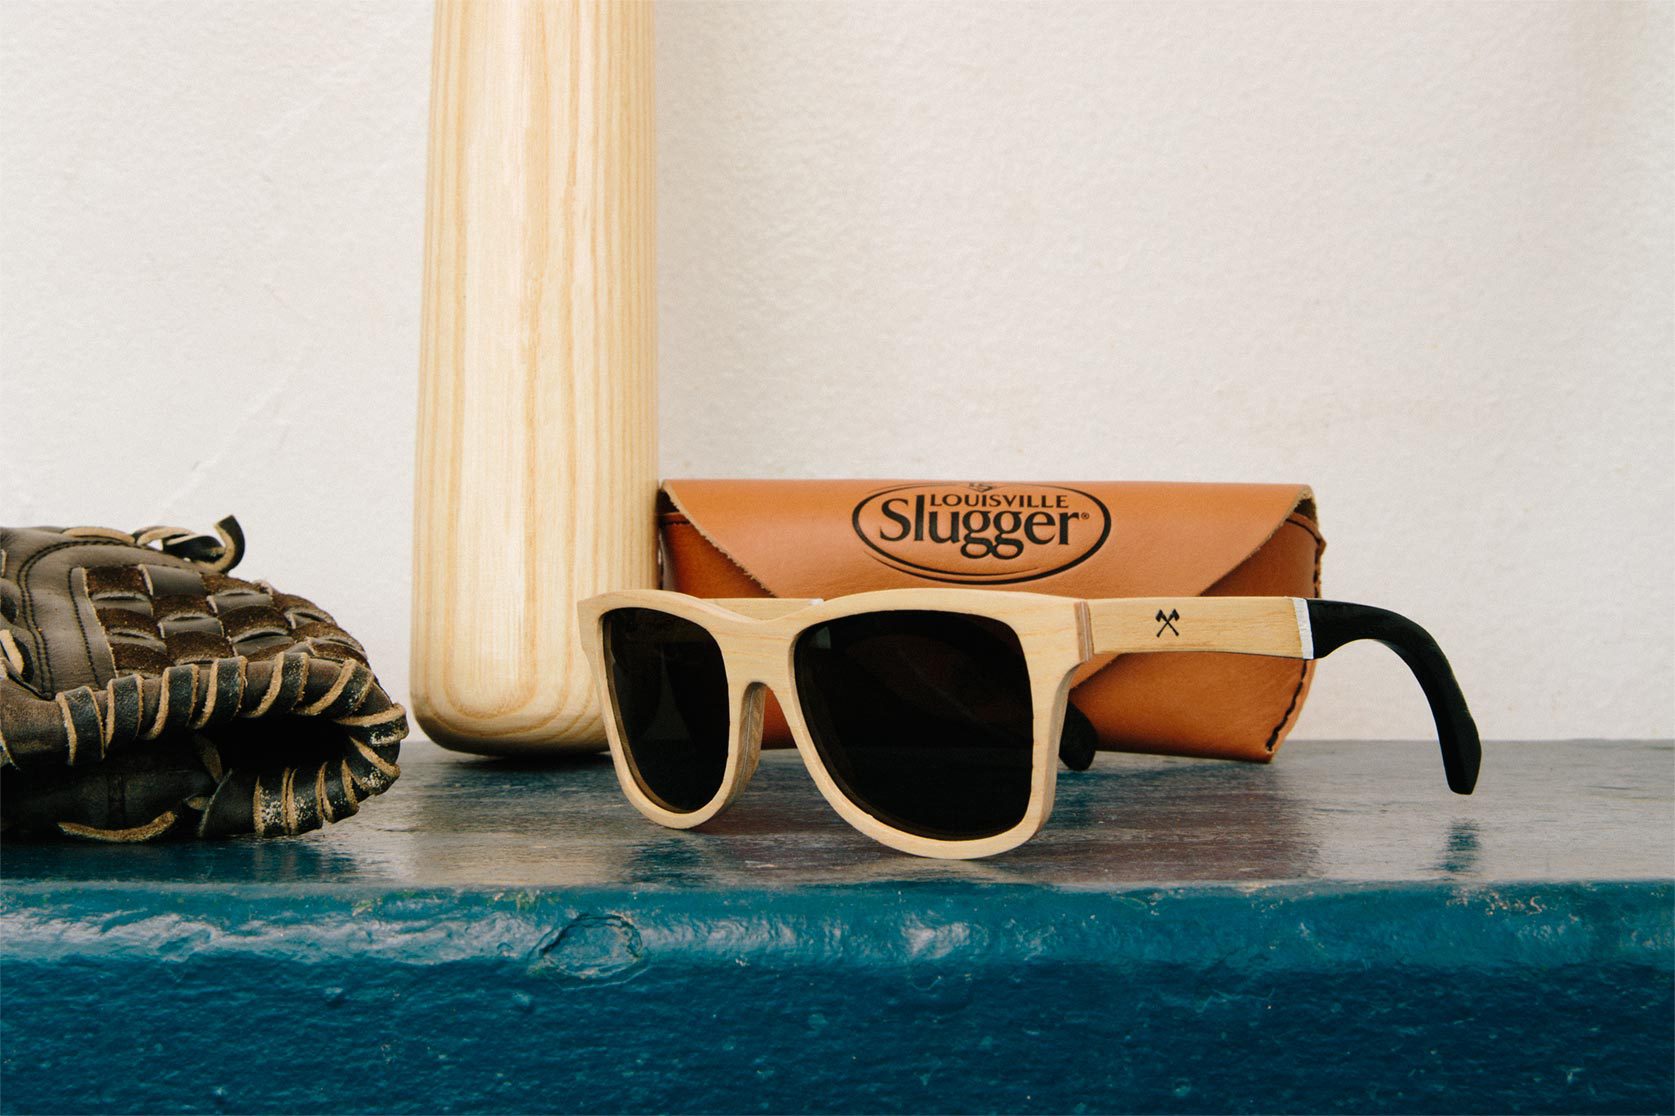 shwood-louisville-slugger-sunglasses-1